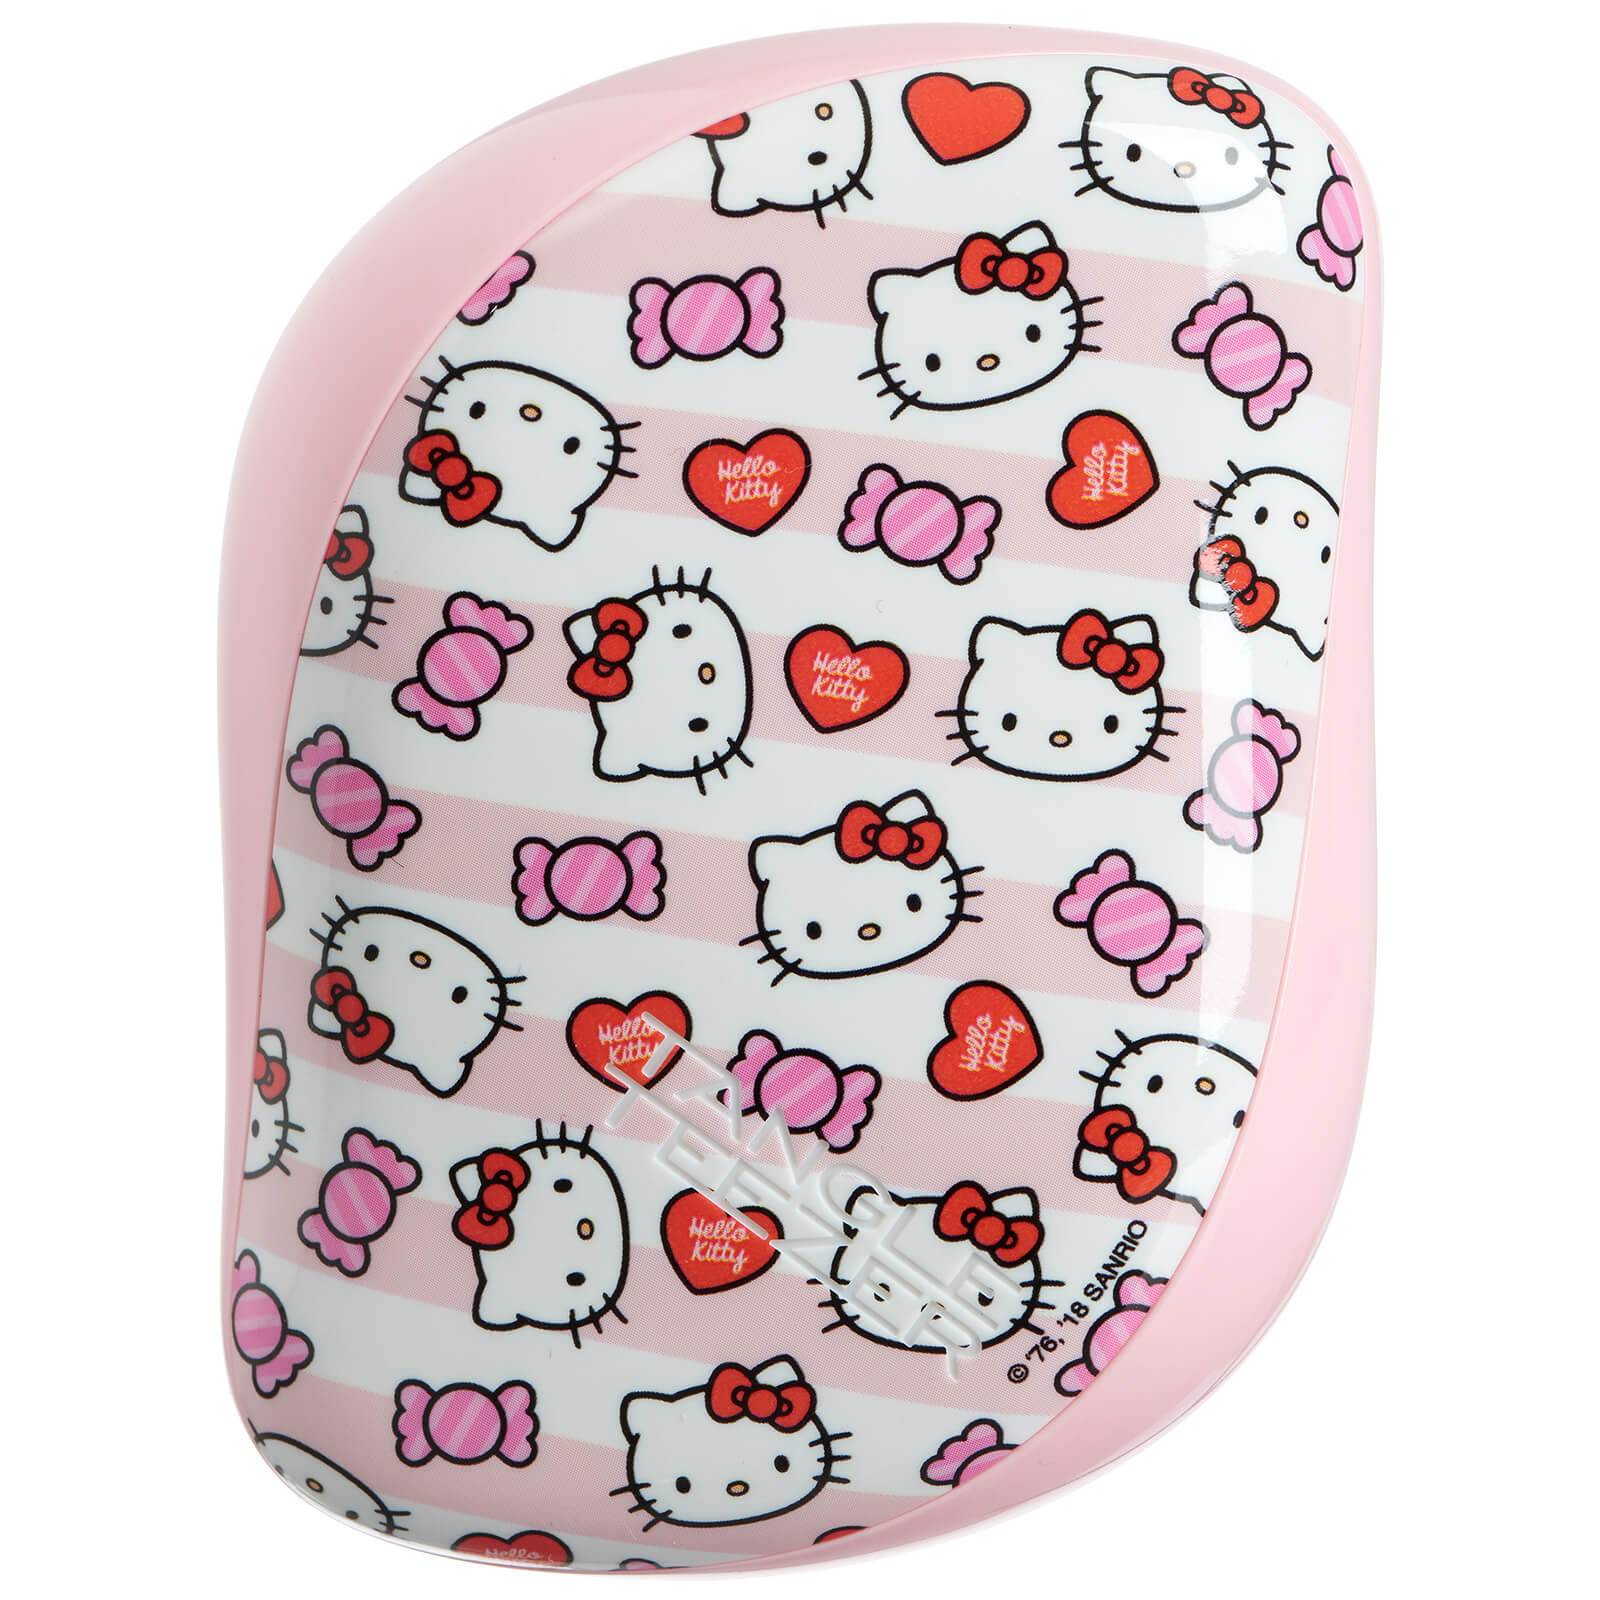 Tangle Teezer Brosse de Poche Compact Styler Hairbrush – Hello Kitty Candy Stripes